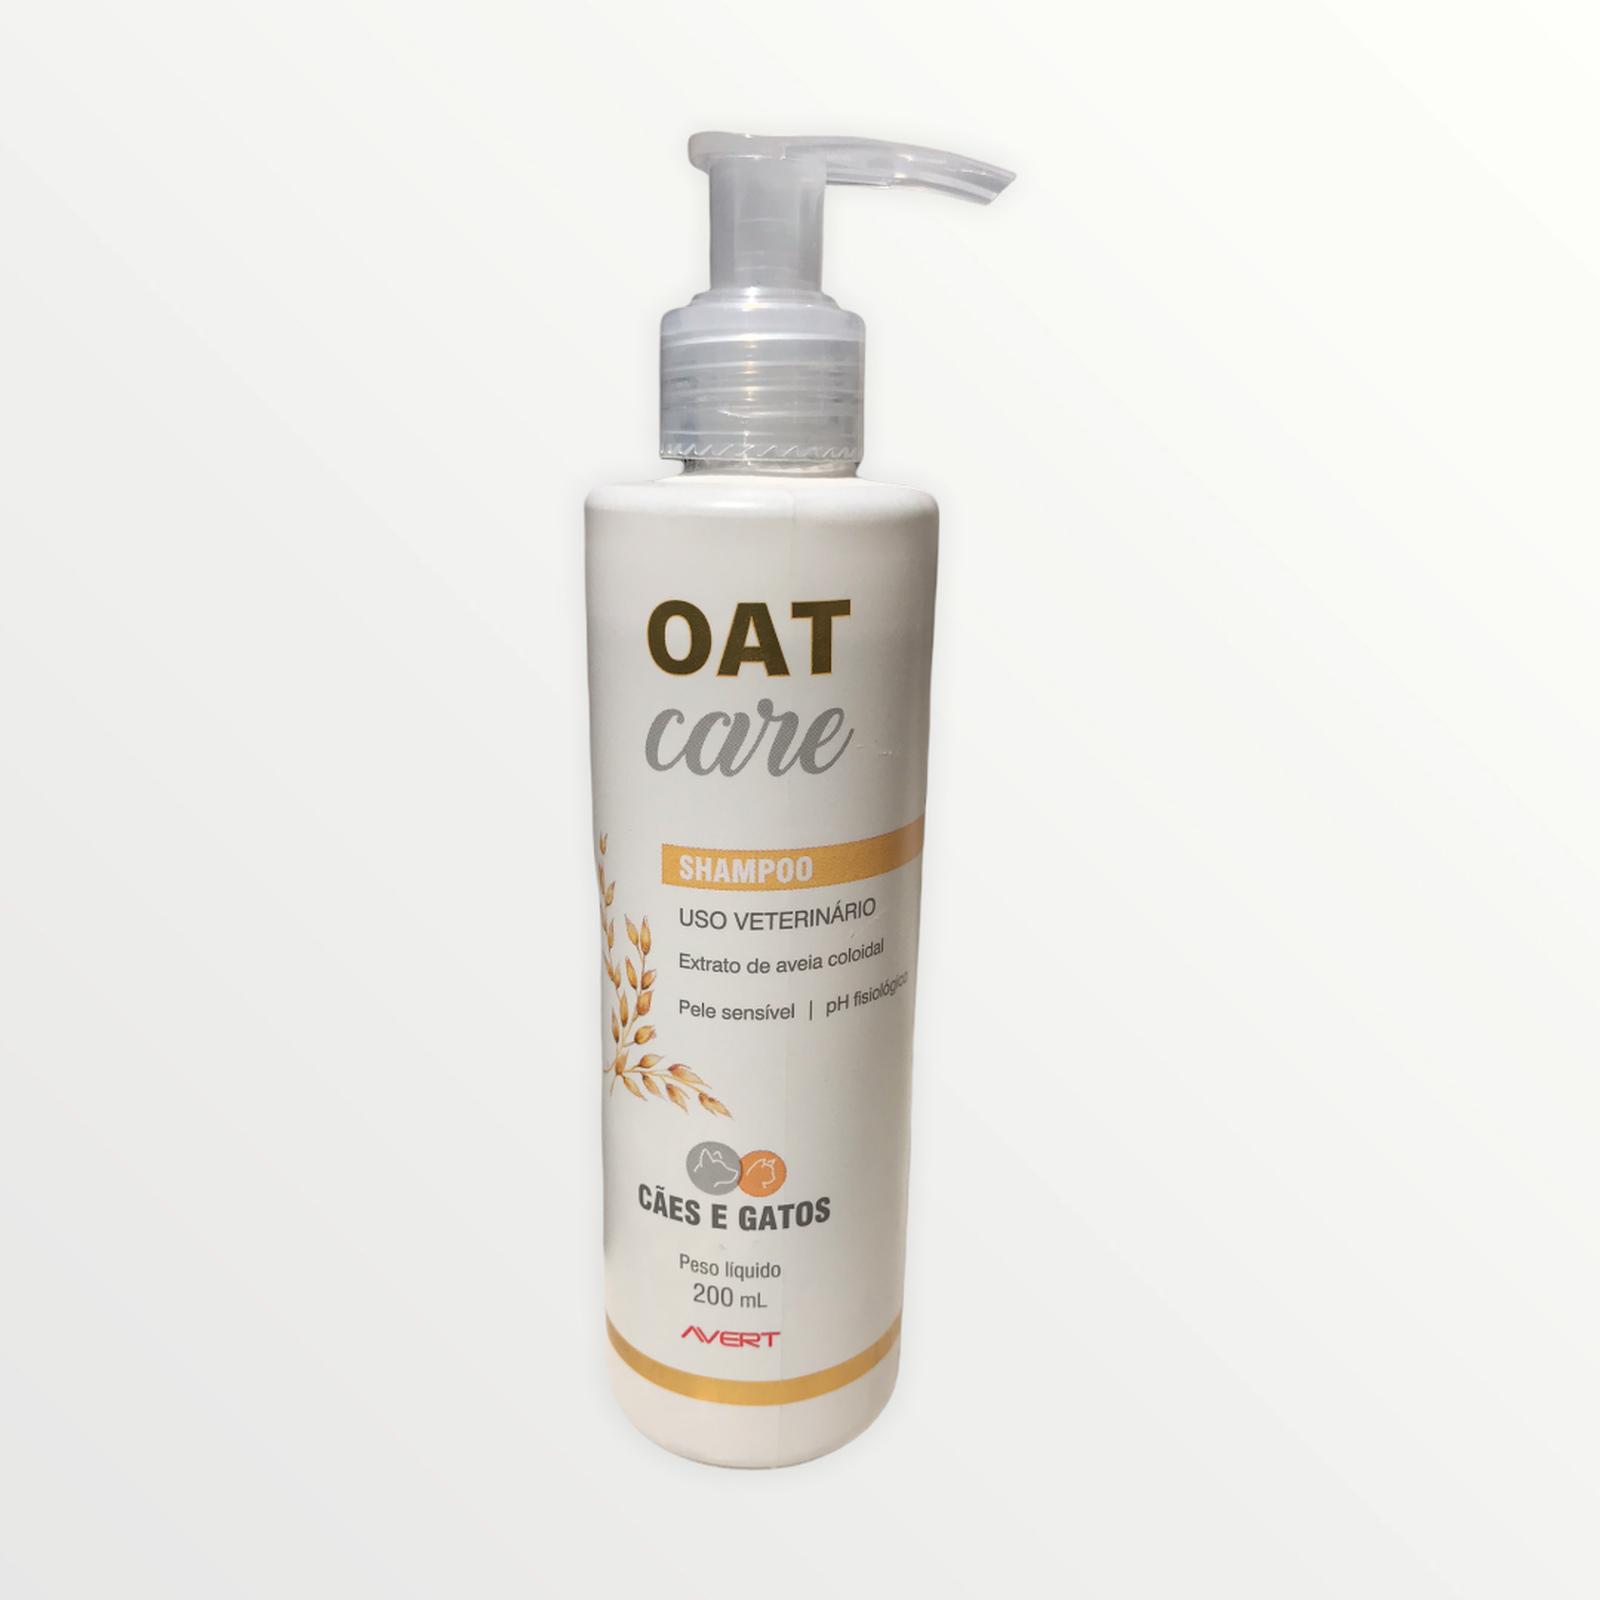 Shampoo Oat Care 200ml - Avert